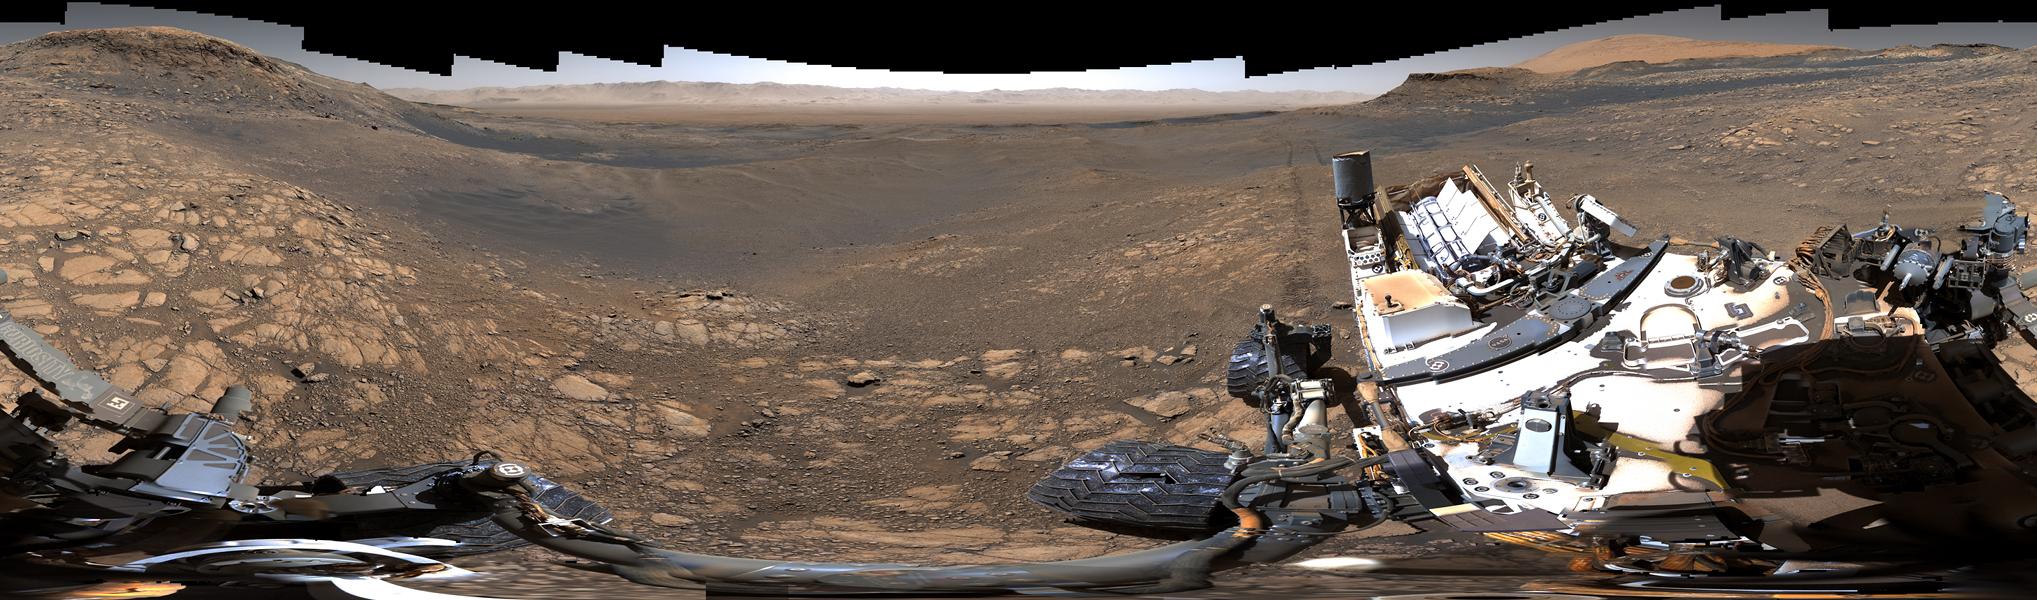 Panoráma Marsu z Curiosity